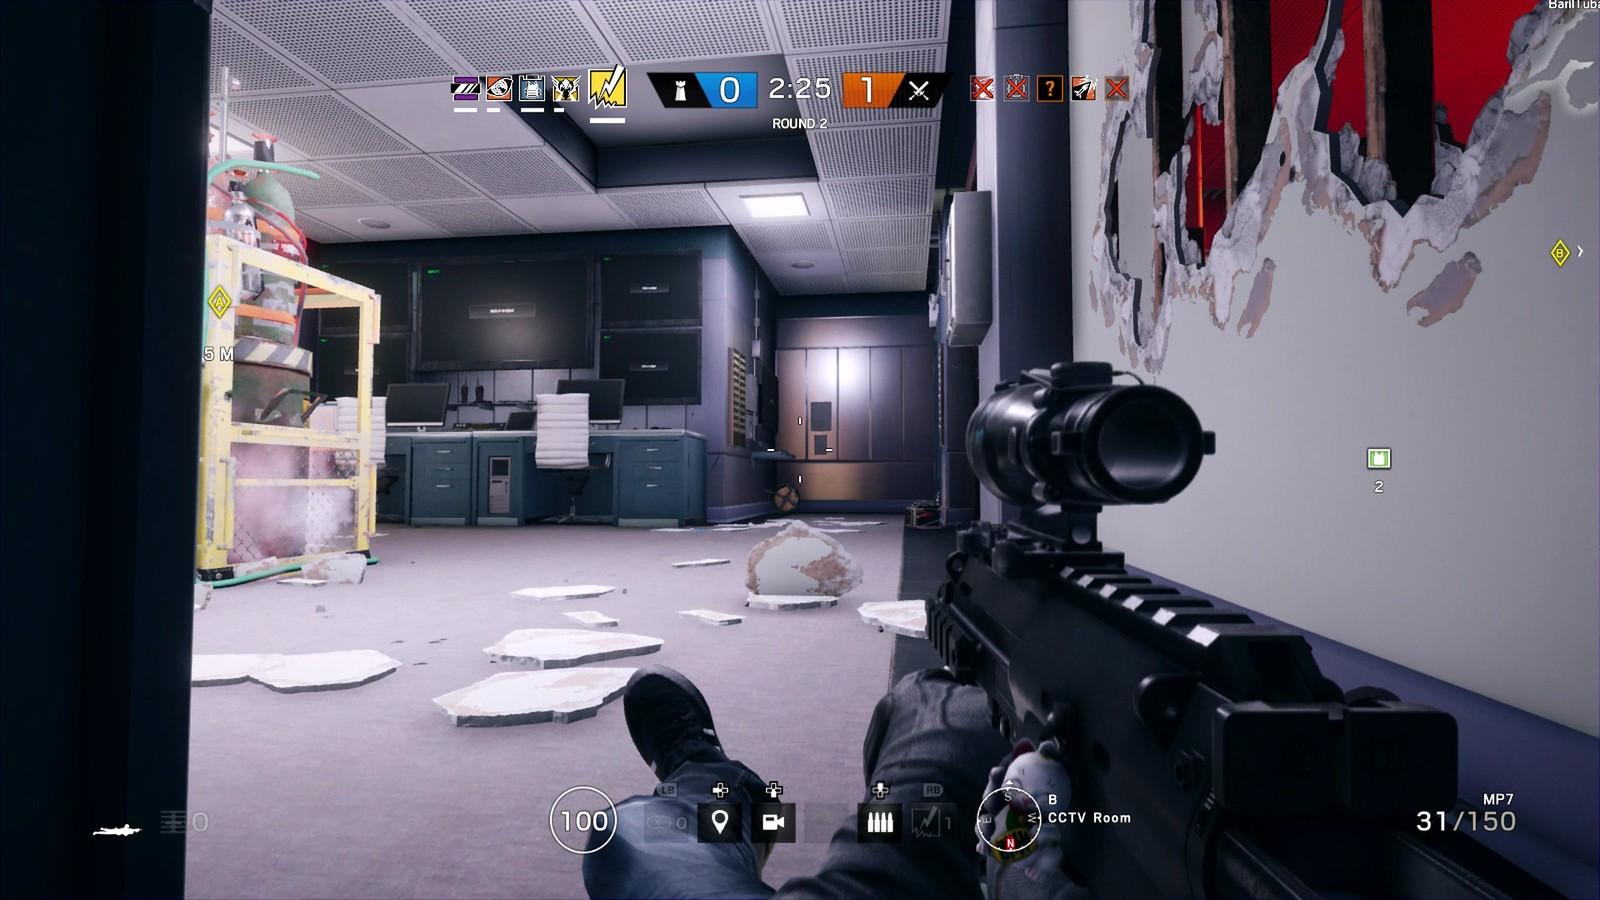 rainbow-six-siege-screenshot-6